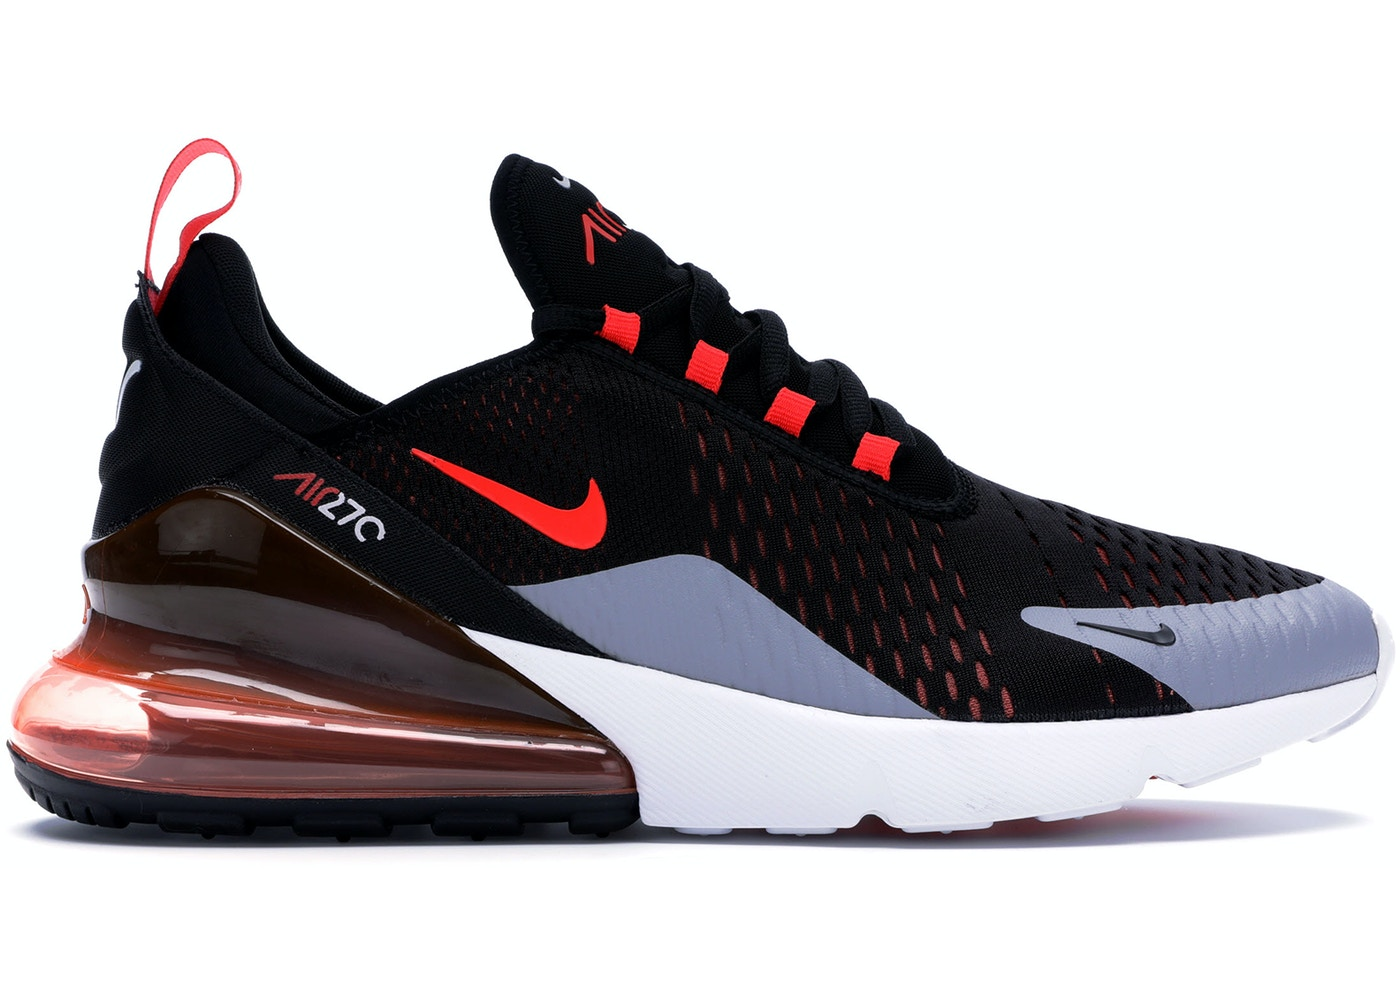 hot sale online 4d1c6 6454c Buy Nike Air Max 270 Shoes & Deadstock Sneakers